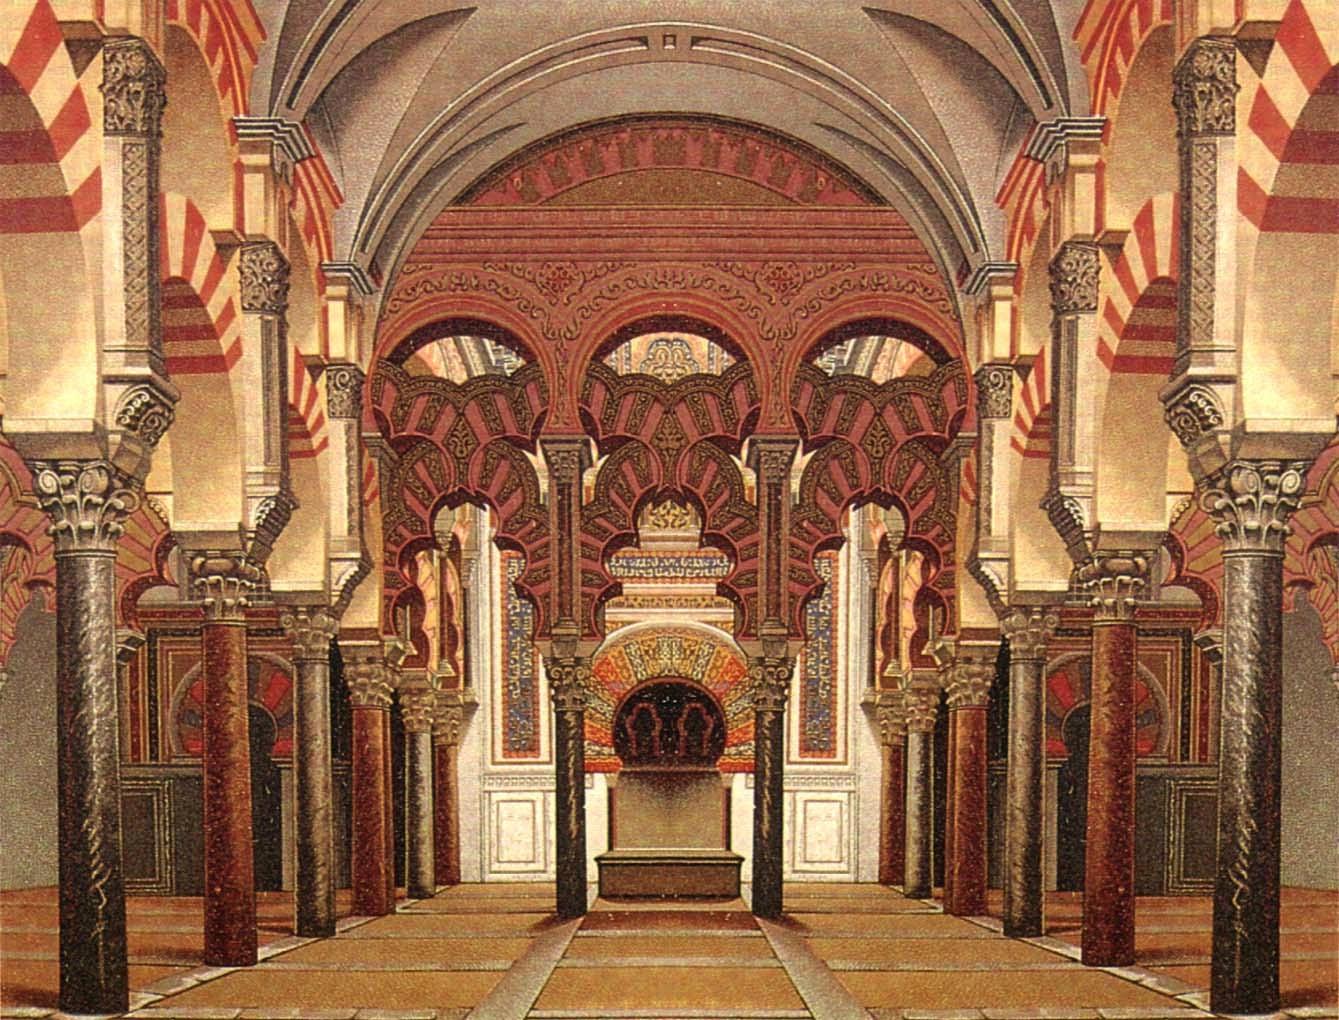 Unusual Historicals: Wonders and Marvels: The Mezquita of Córdoba